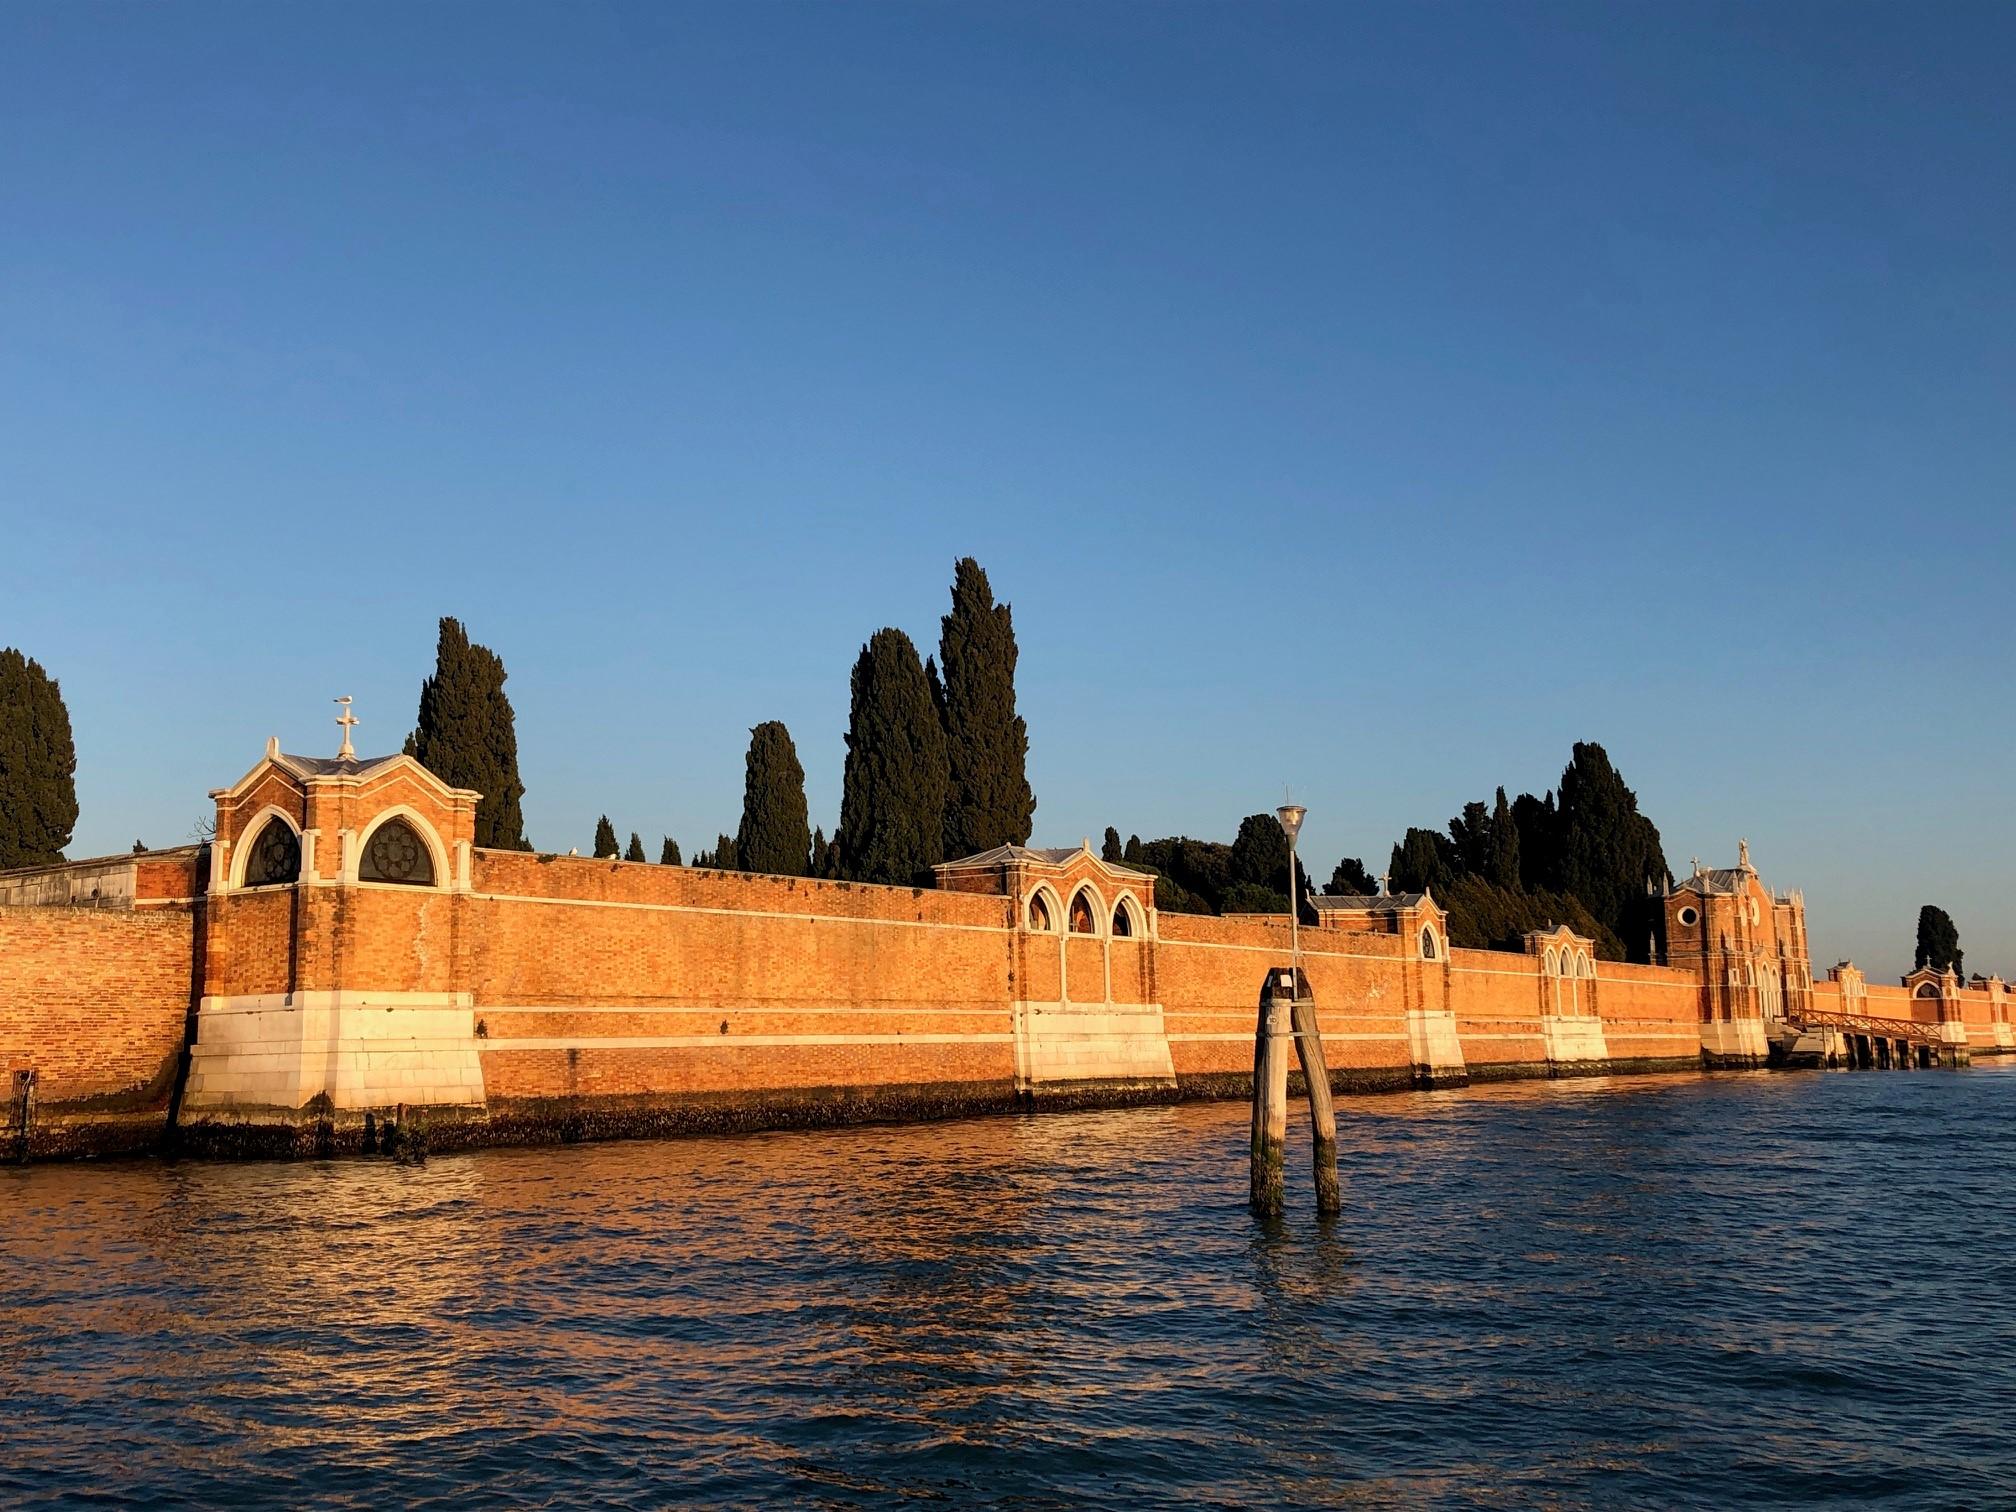 San Michele, Venezia - cemetery island basking in the evening sun